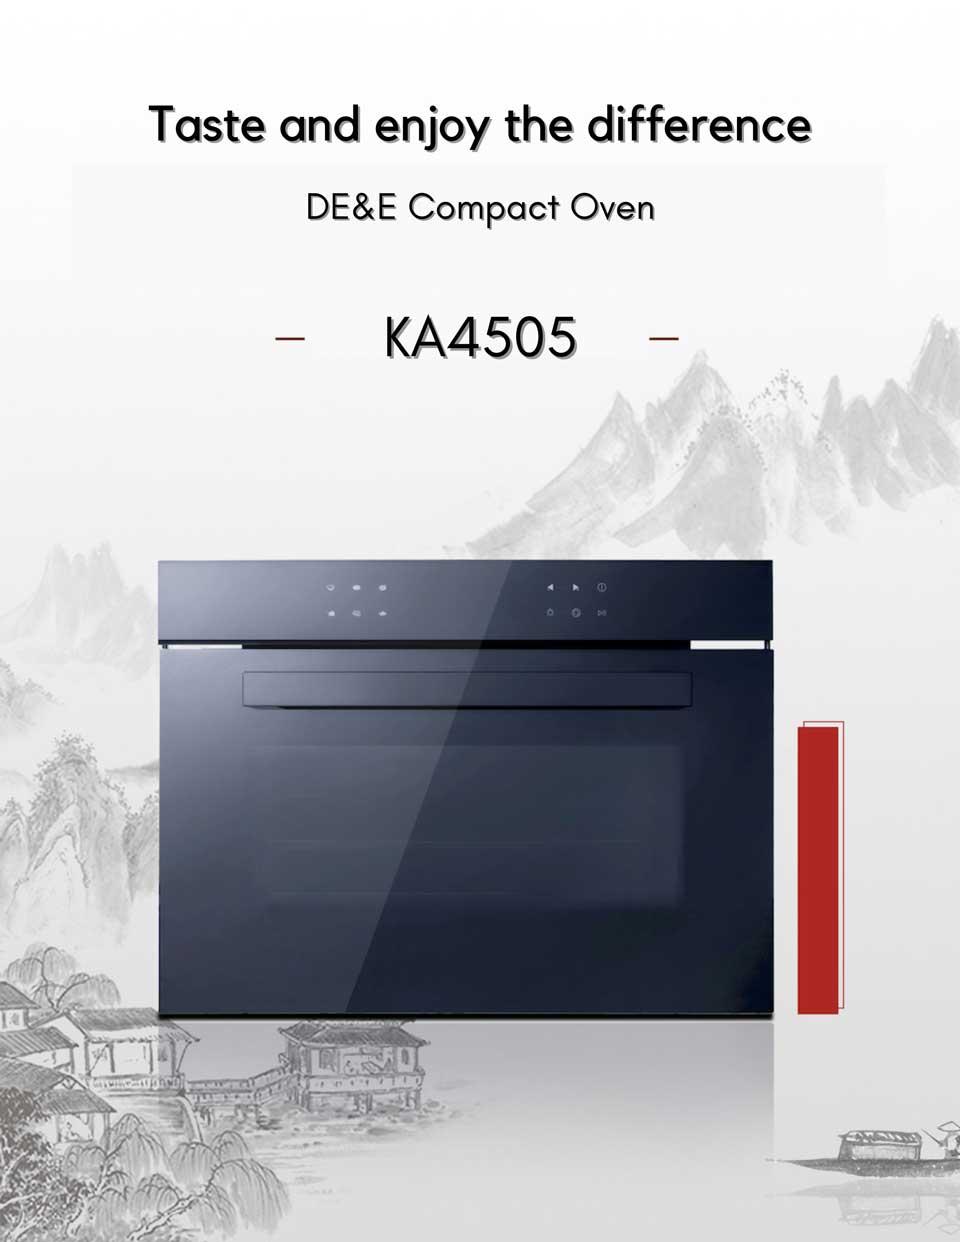 high capacity 45L de&e KA4505 built-in compact oven